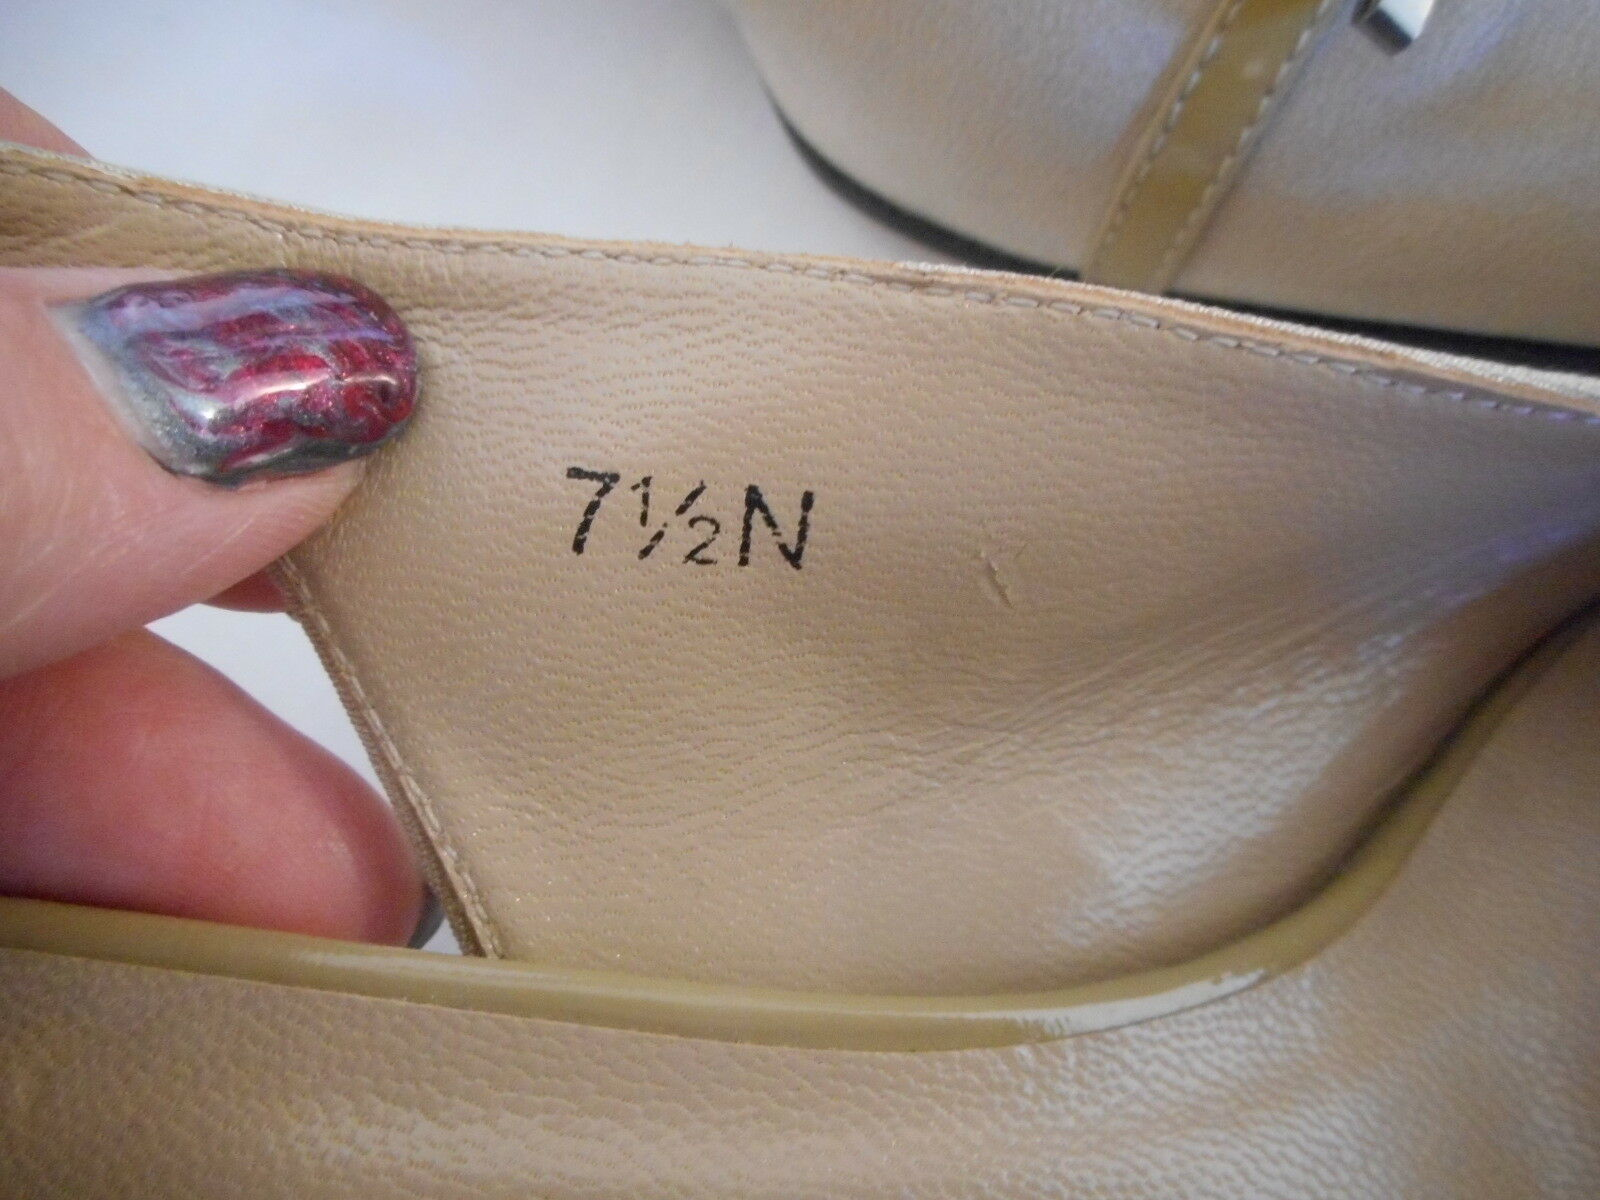 VANELi VAN ELi 7.5 N narrow Beige Womens 2 inch heel buckle sling back Shoes